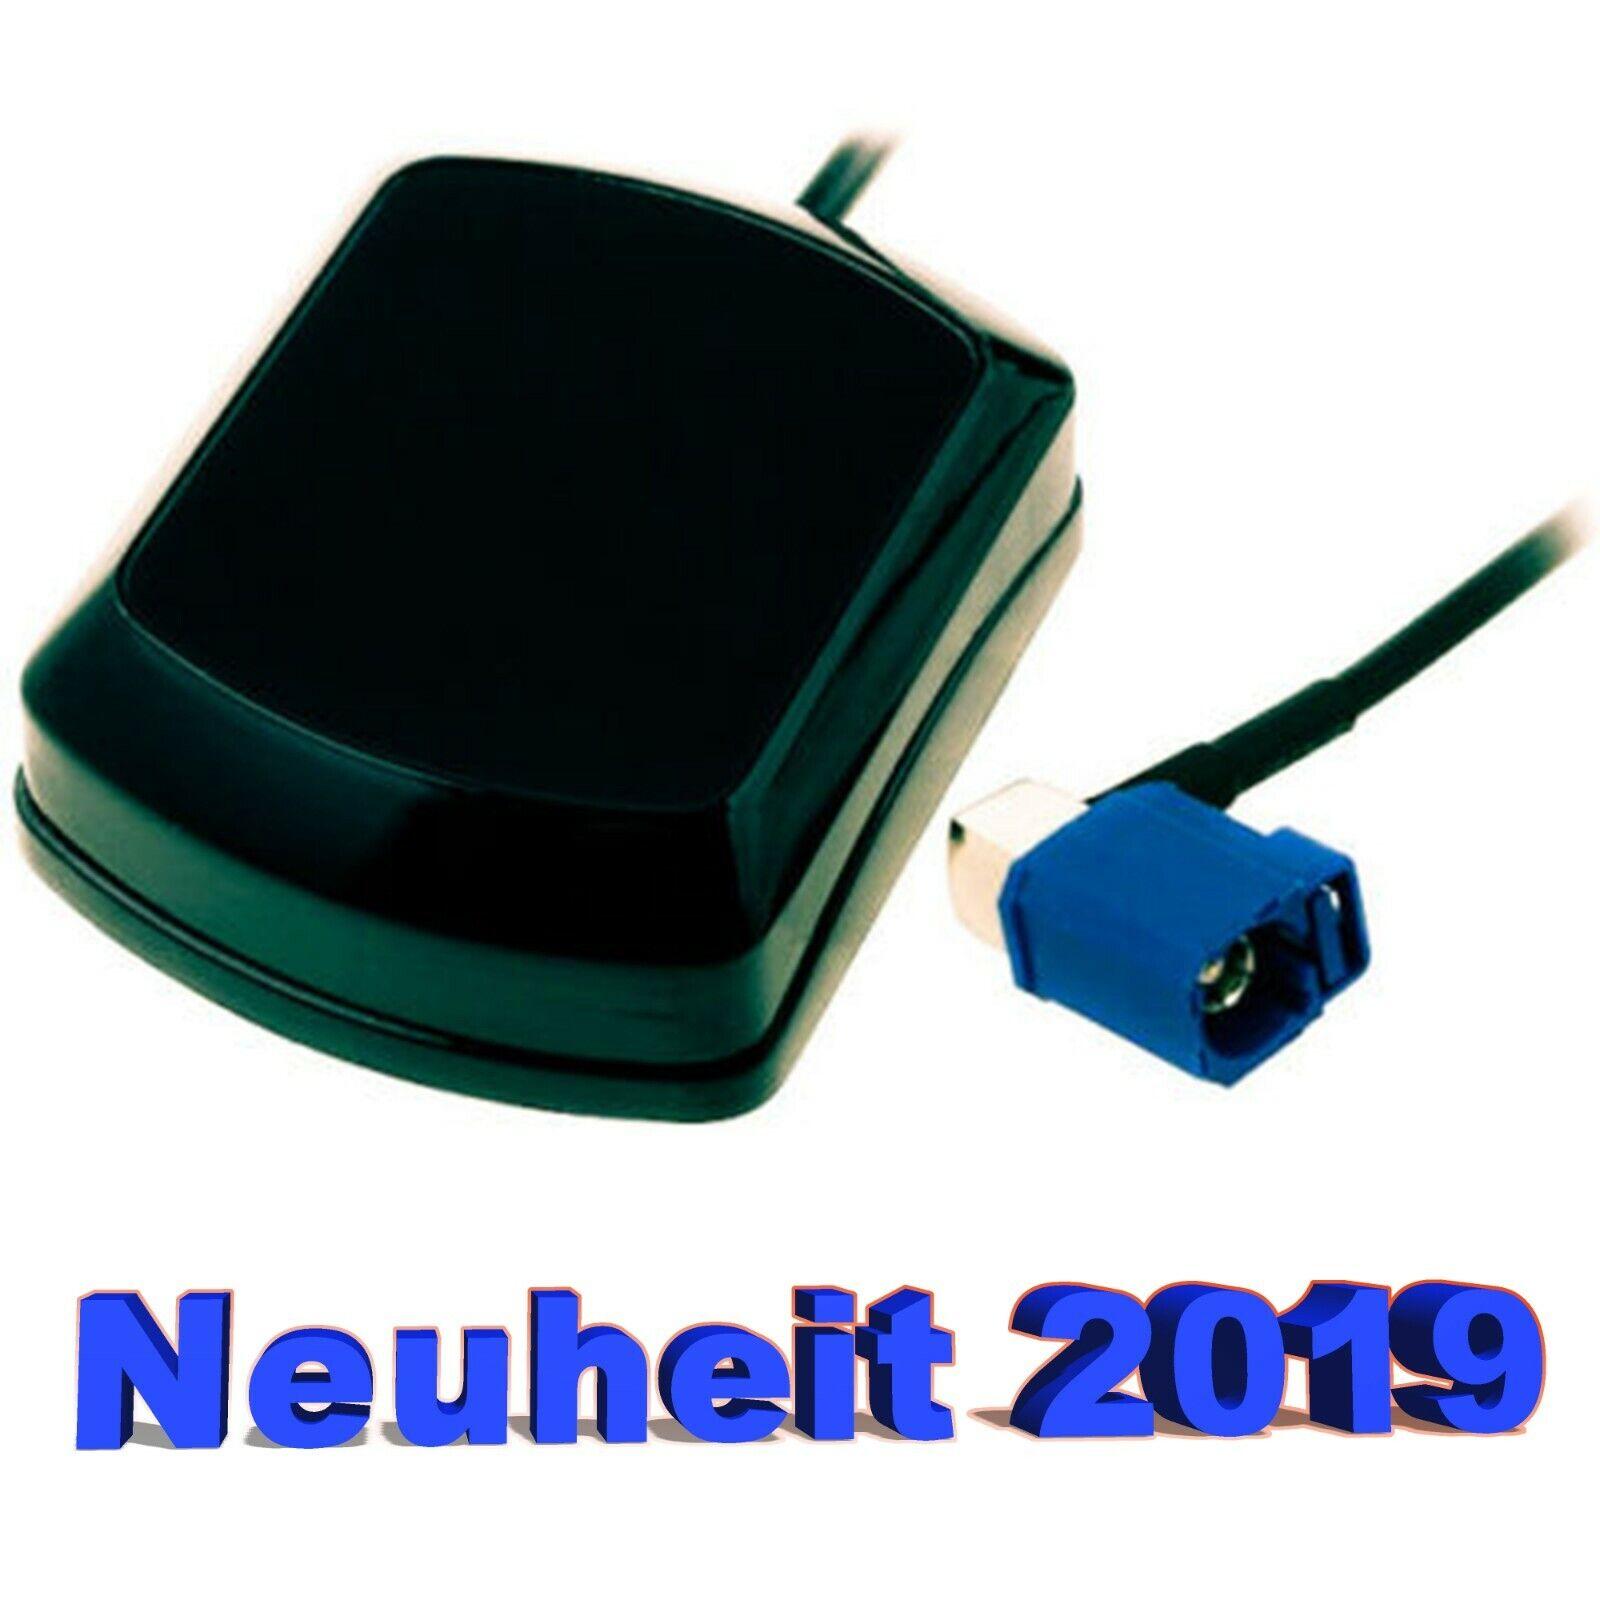 KFZ-ANTENNENFUSS FM PKW GPS VW RAKU2 Triplex Stabantenne Antennenfuss RAKU2 NAVI